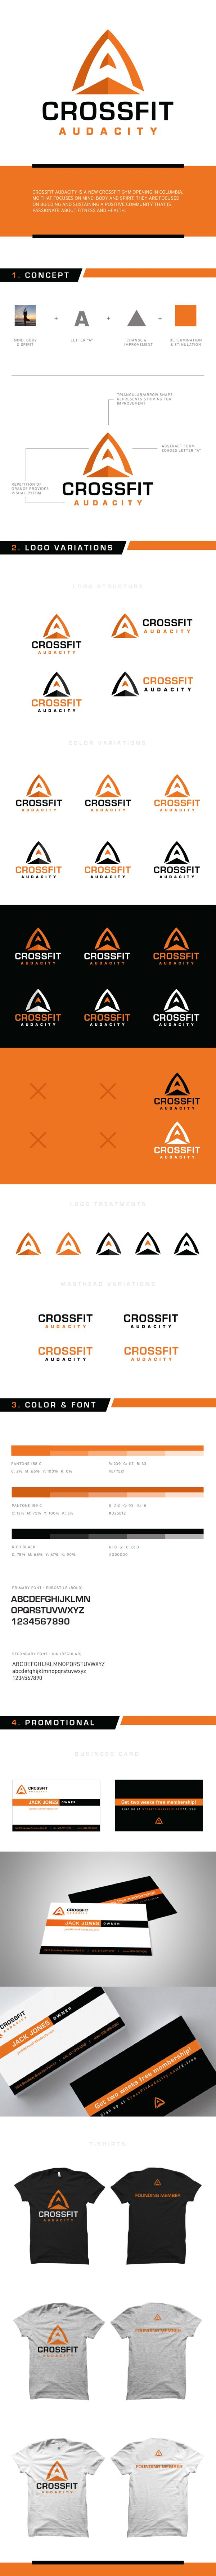 CrossFit Audacity by William Frazier, via Behance